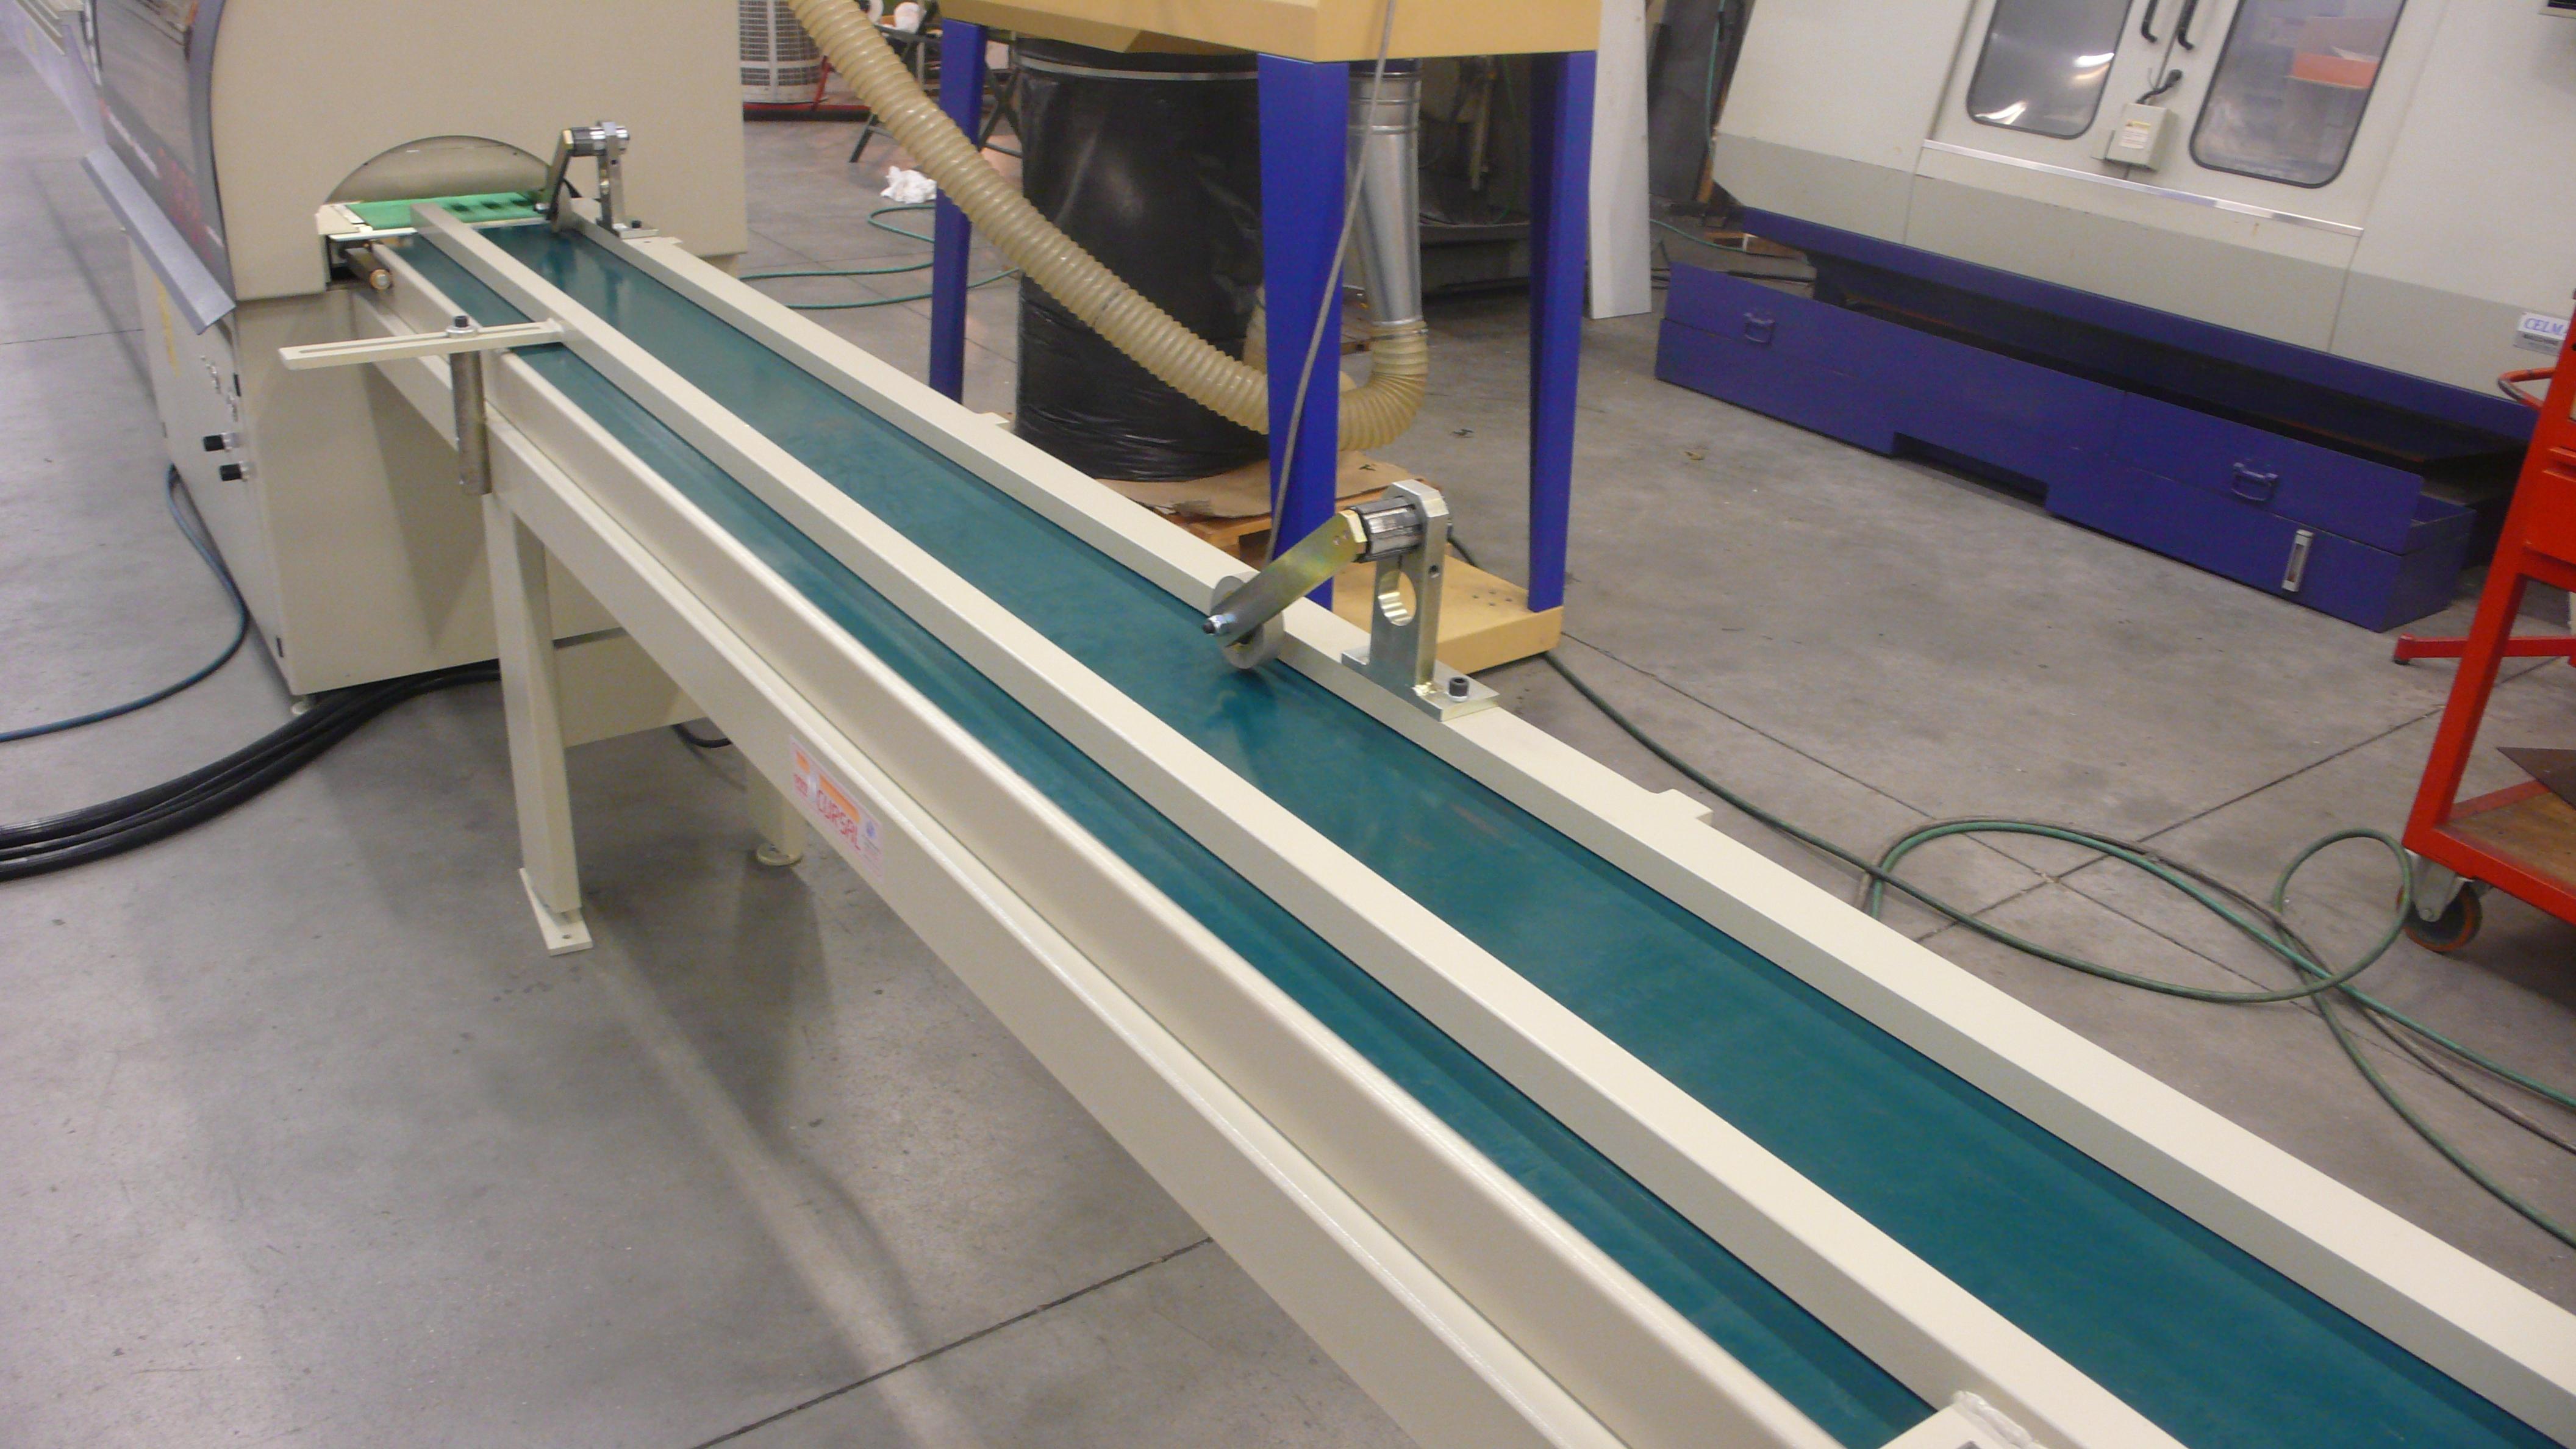 cursal-mardegan legno-trv 1700E 500S-2016 (5)